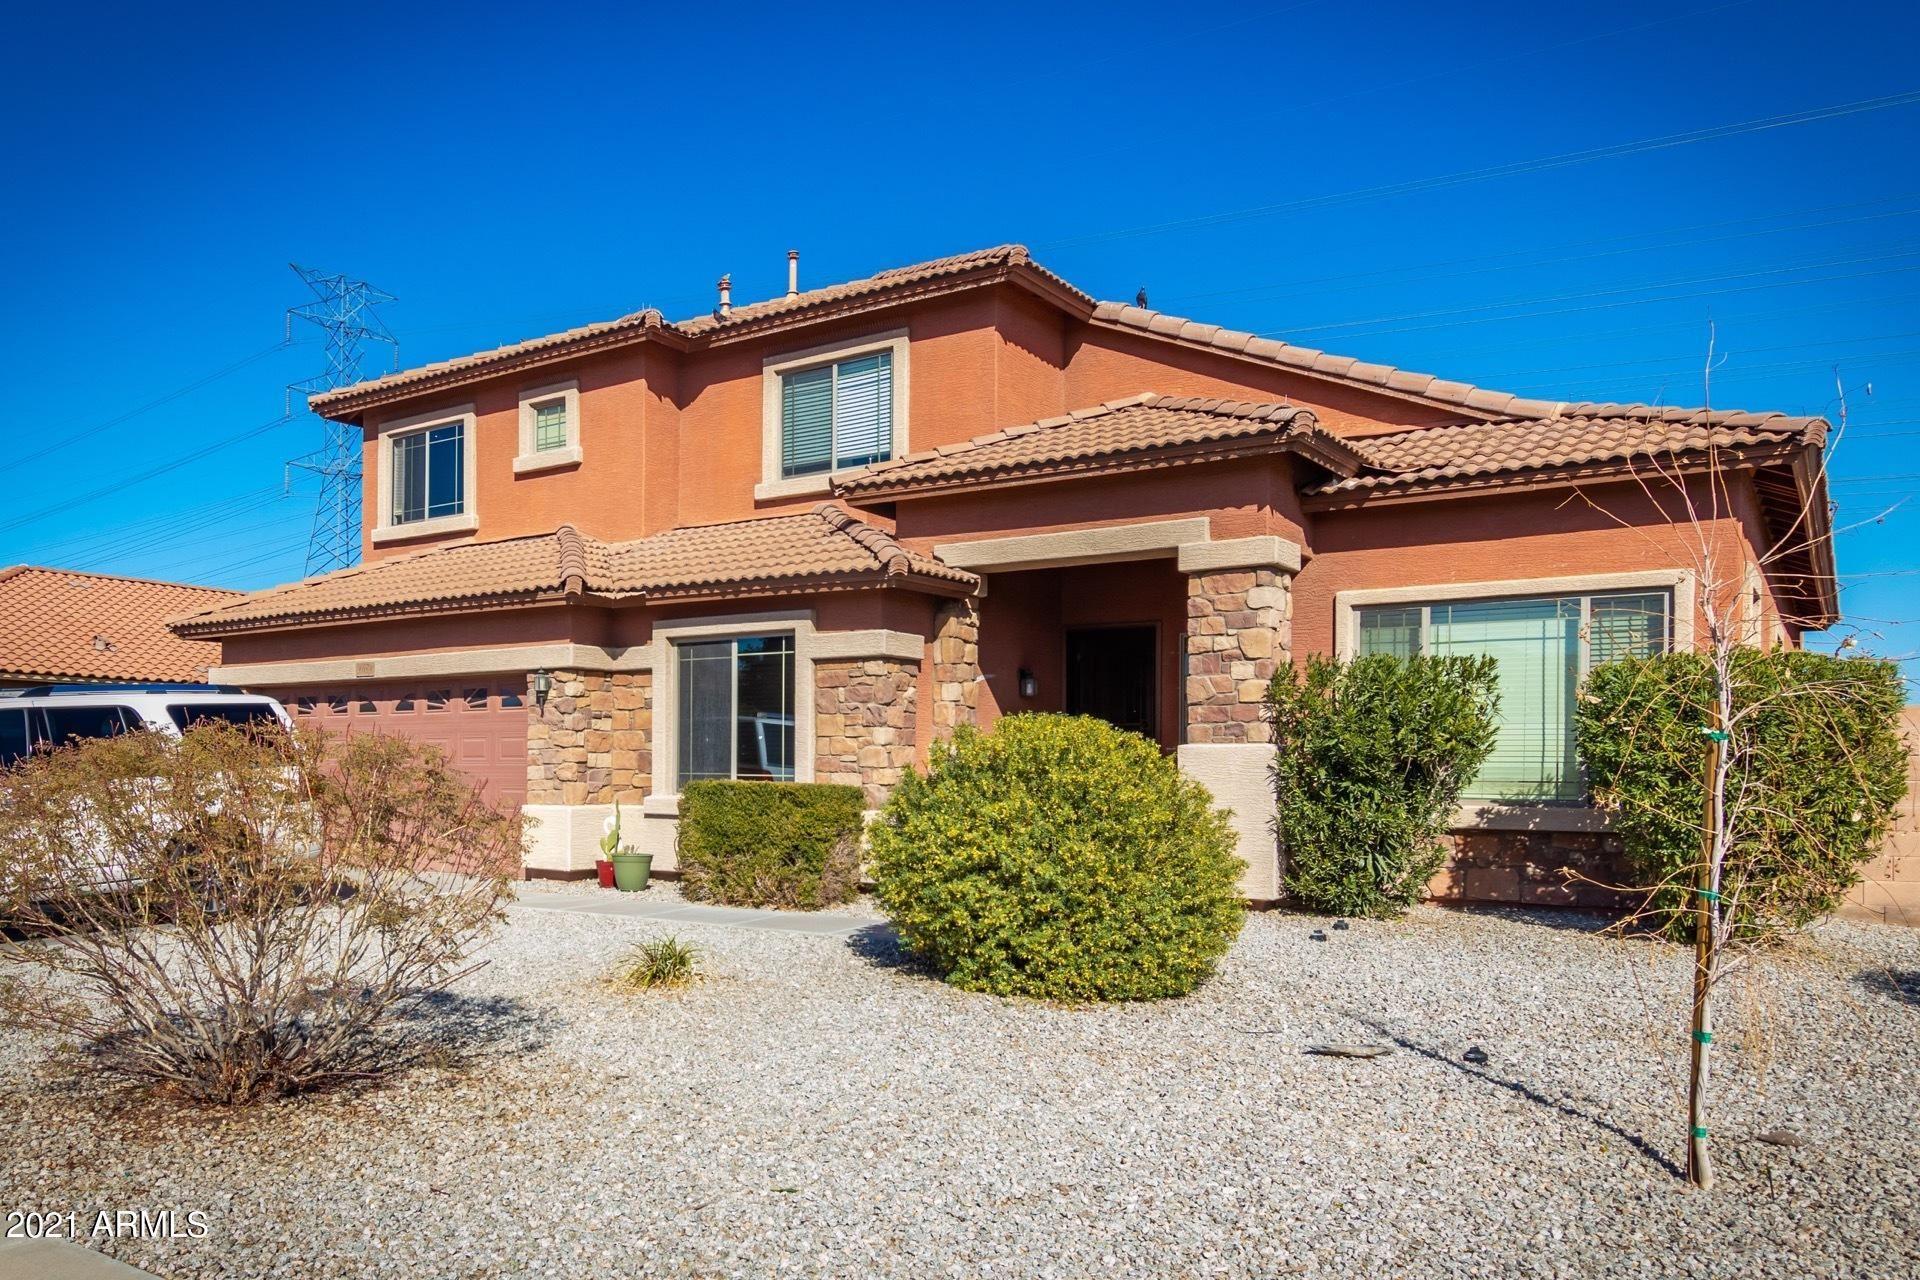 Photo of 3013 S 121ST Drive, Tolleson, AZ 85353 (MLS # 6199774)